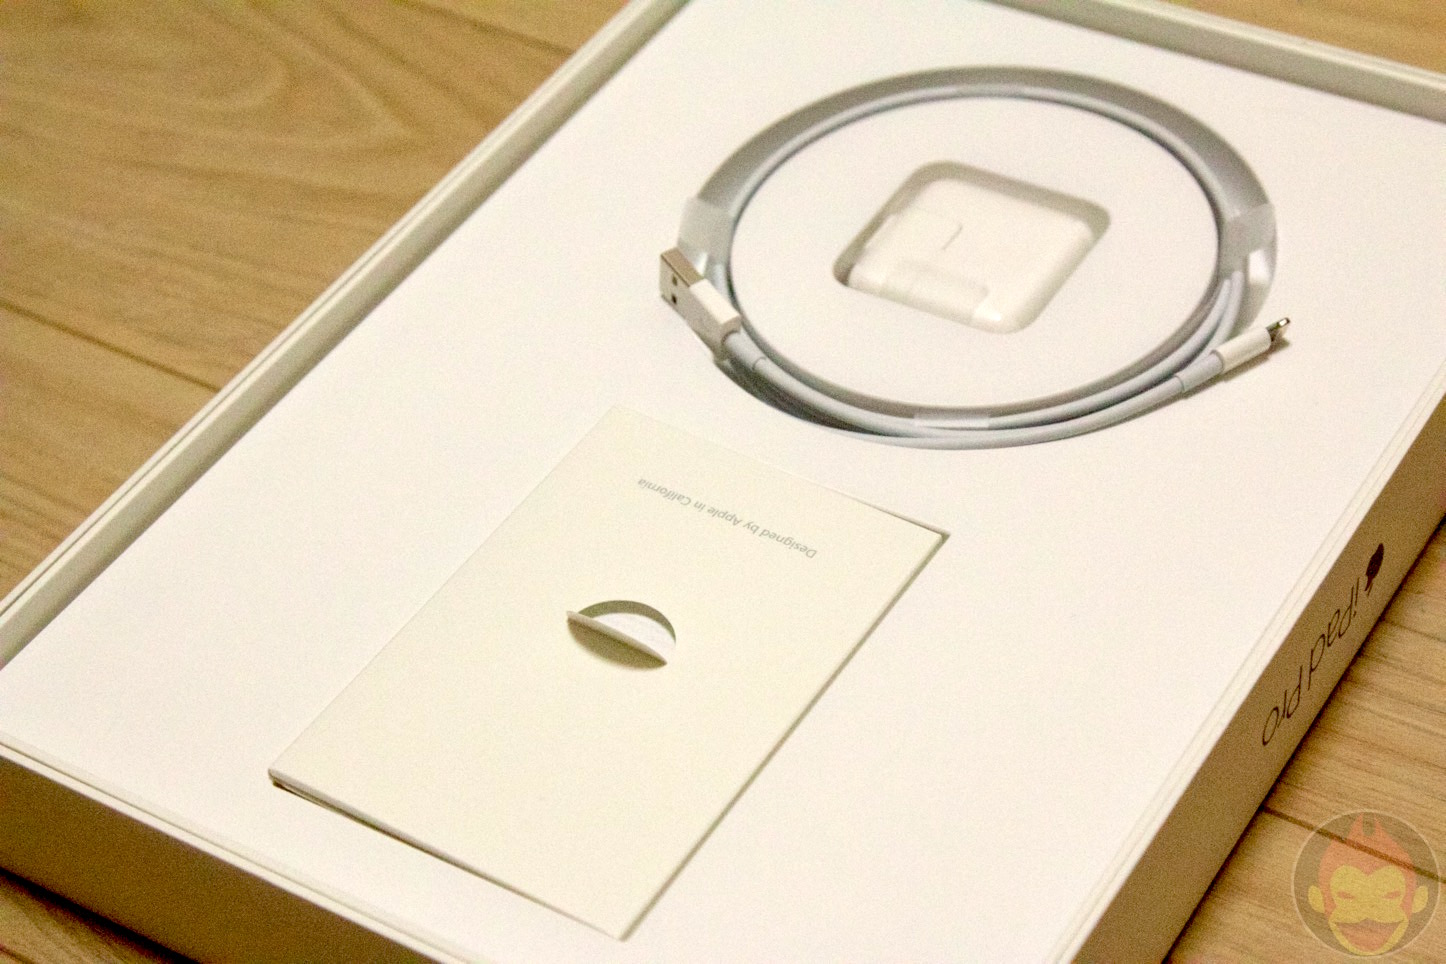 iPad-Pro-Unboxing-03.jpg